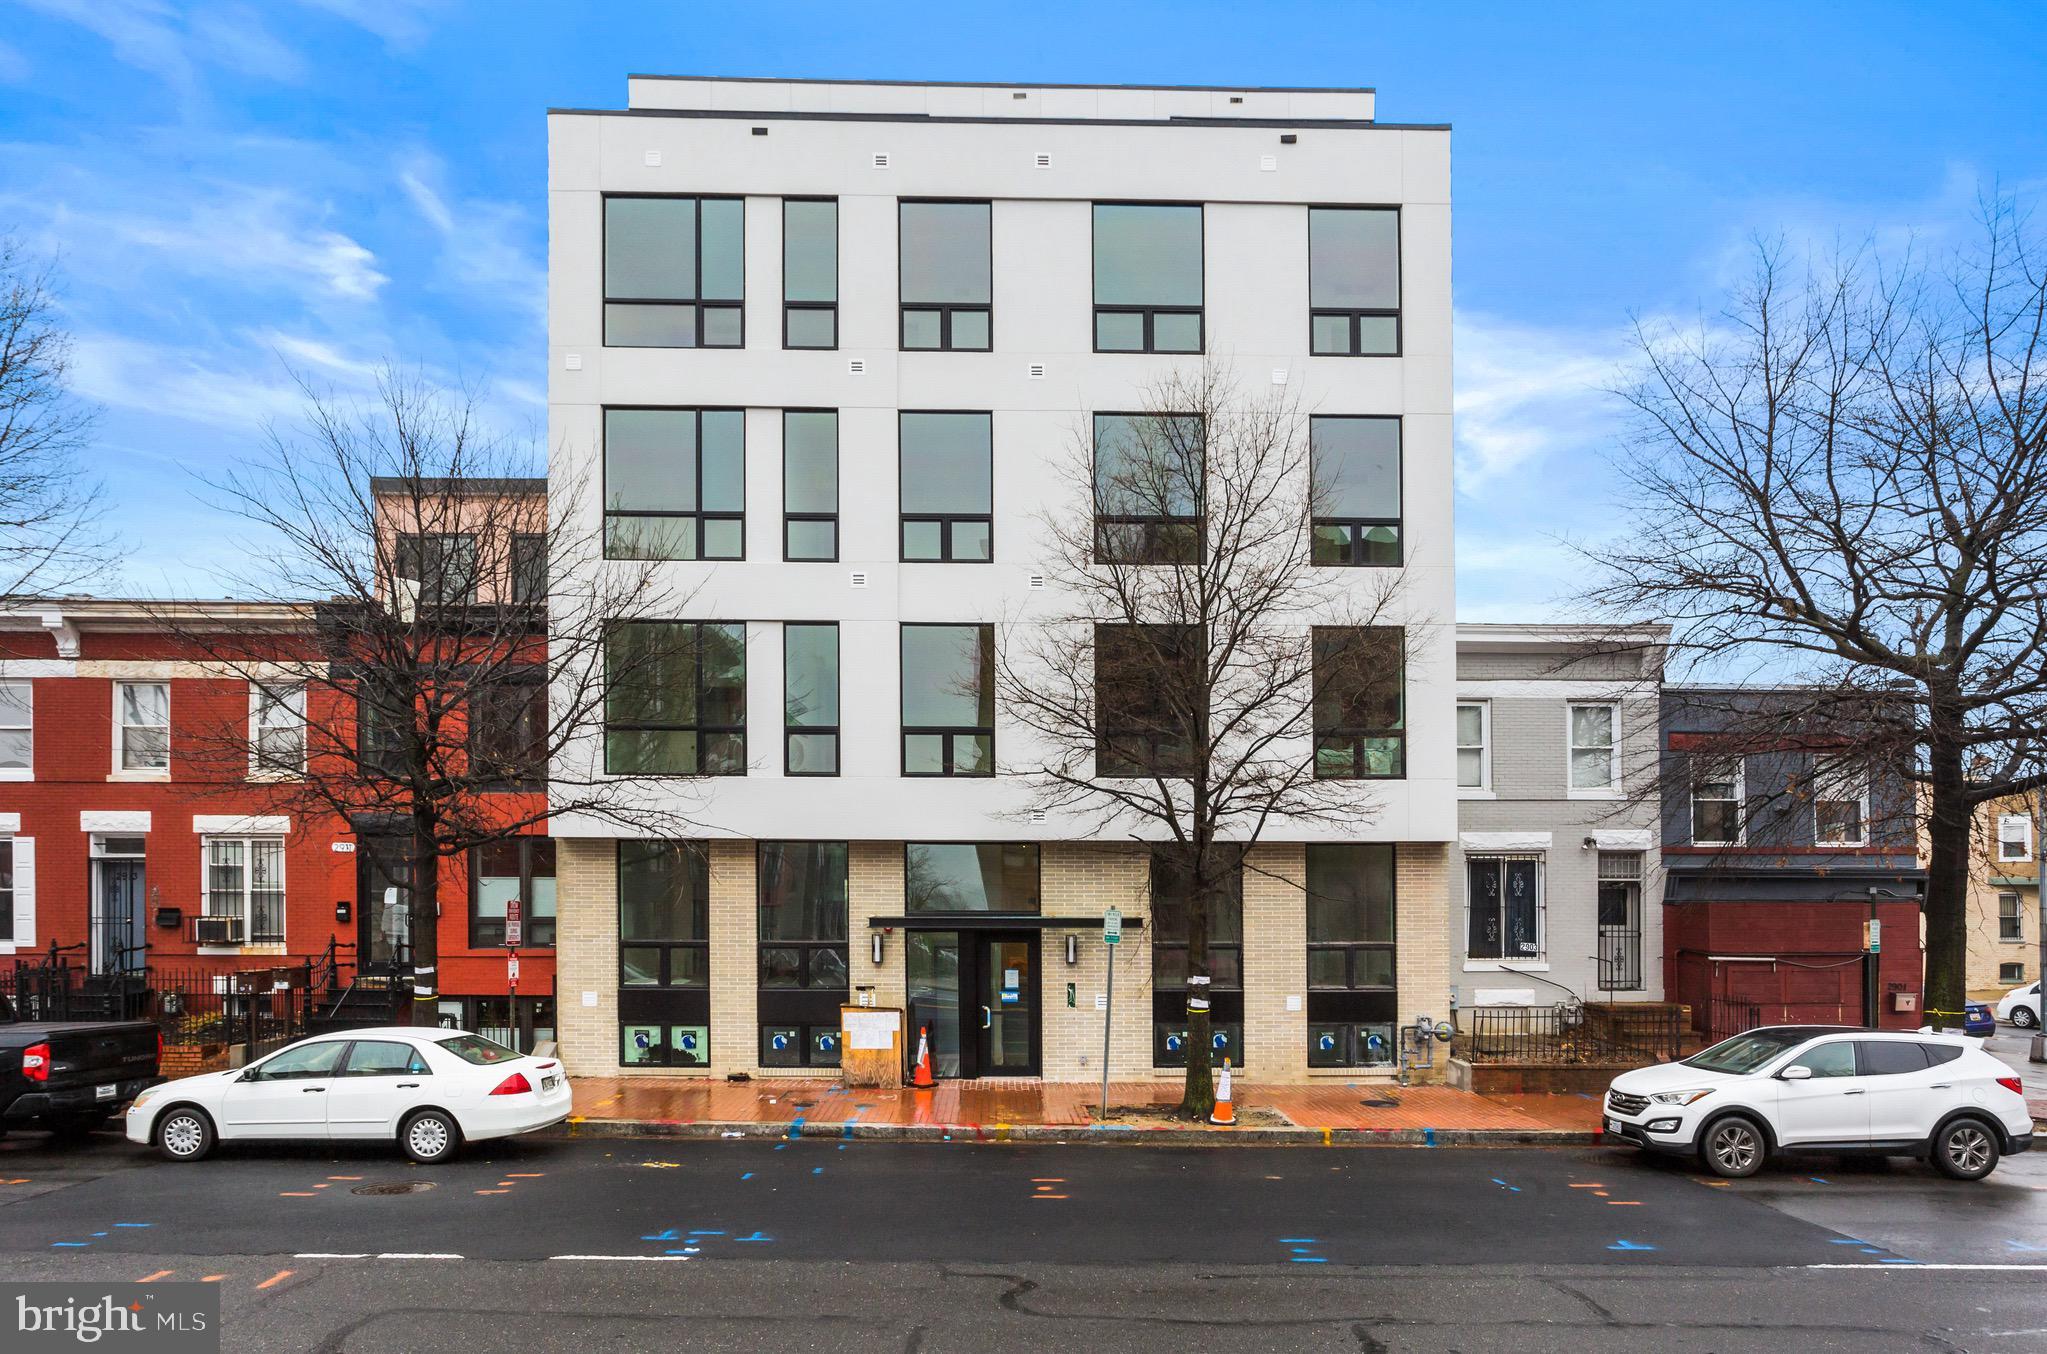 Introducing The Maddox, a new condominium community rising up along Georgia Avenue in Washington's v